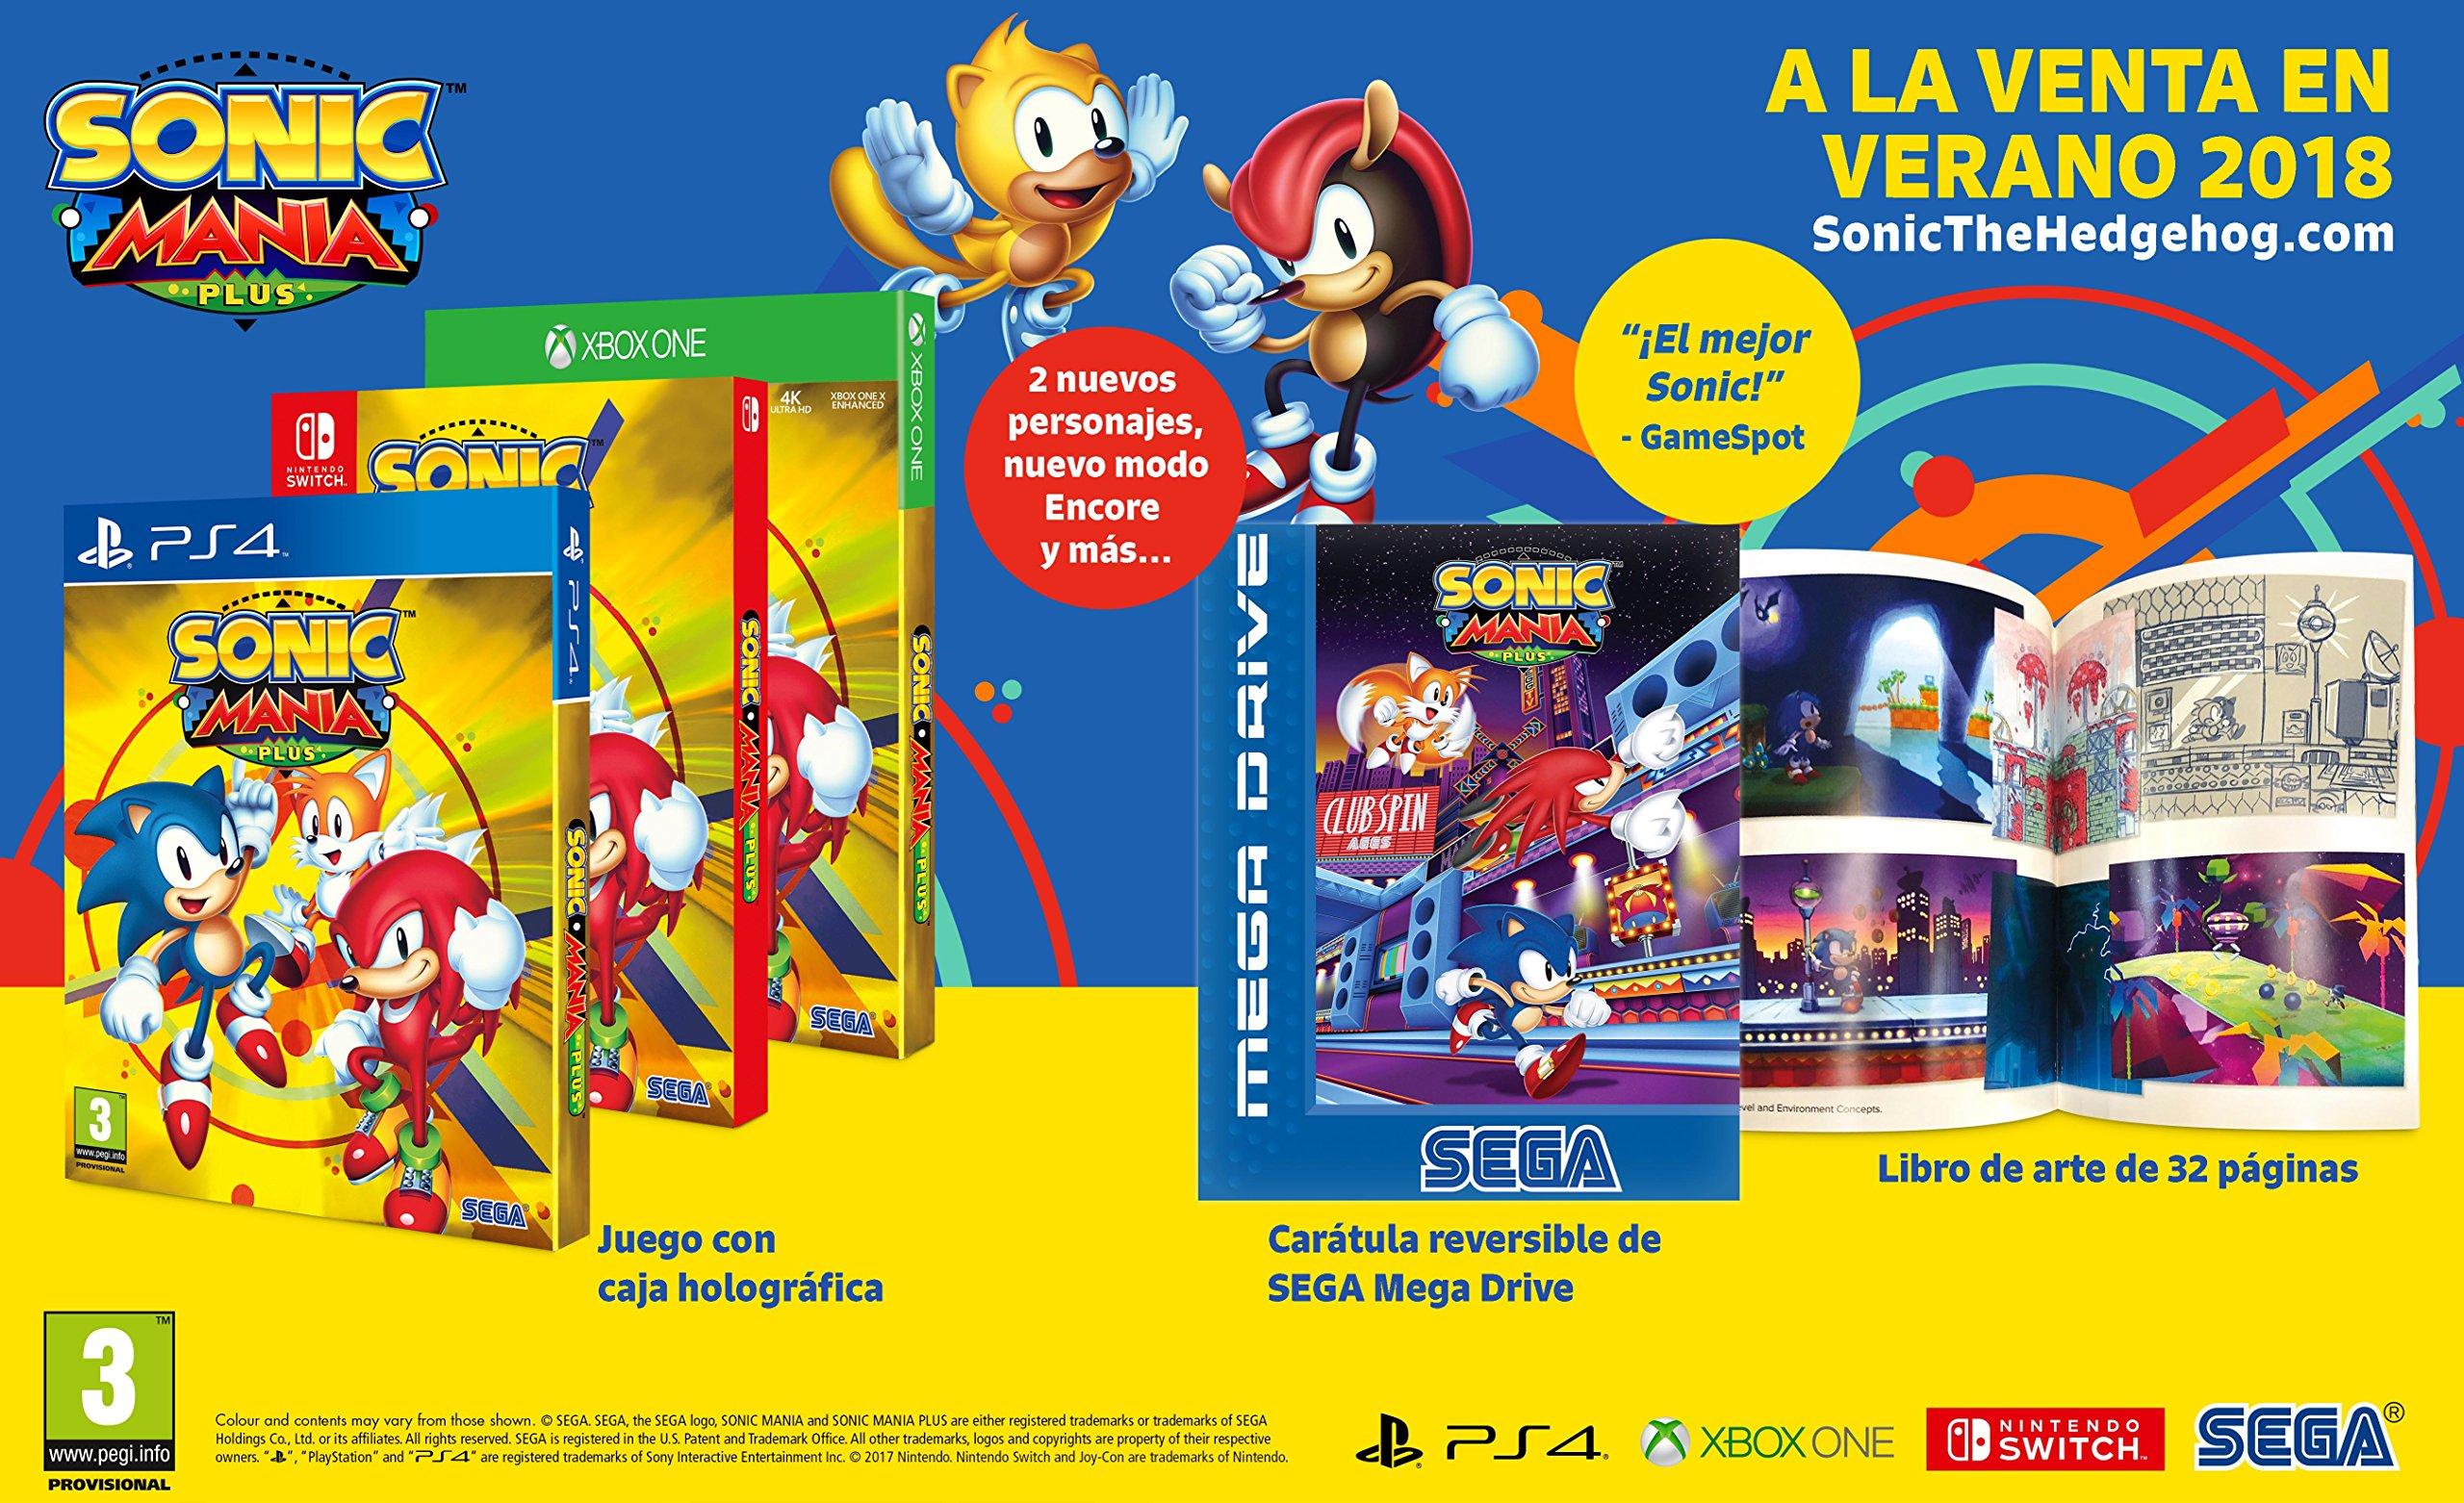 Sonic Mania Plus: Amazon.es: Videojuegos